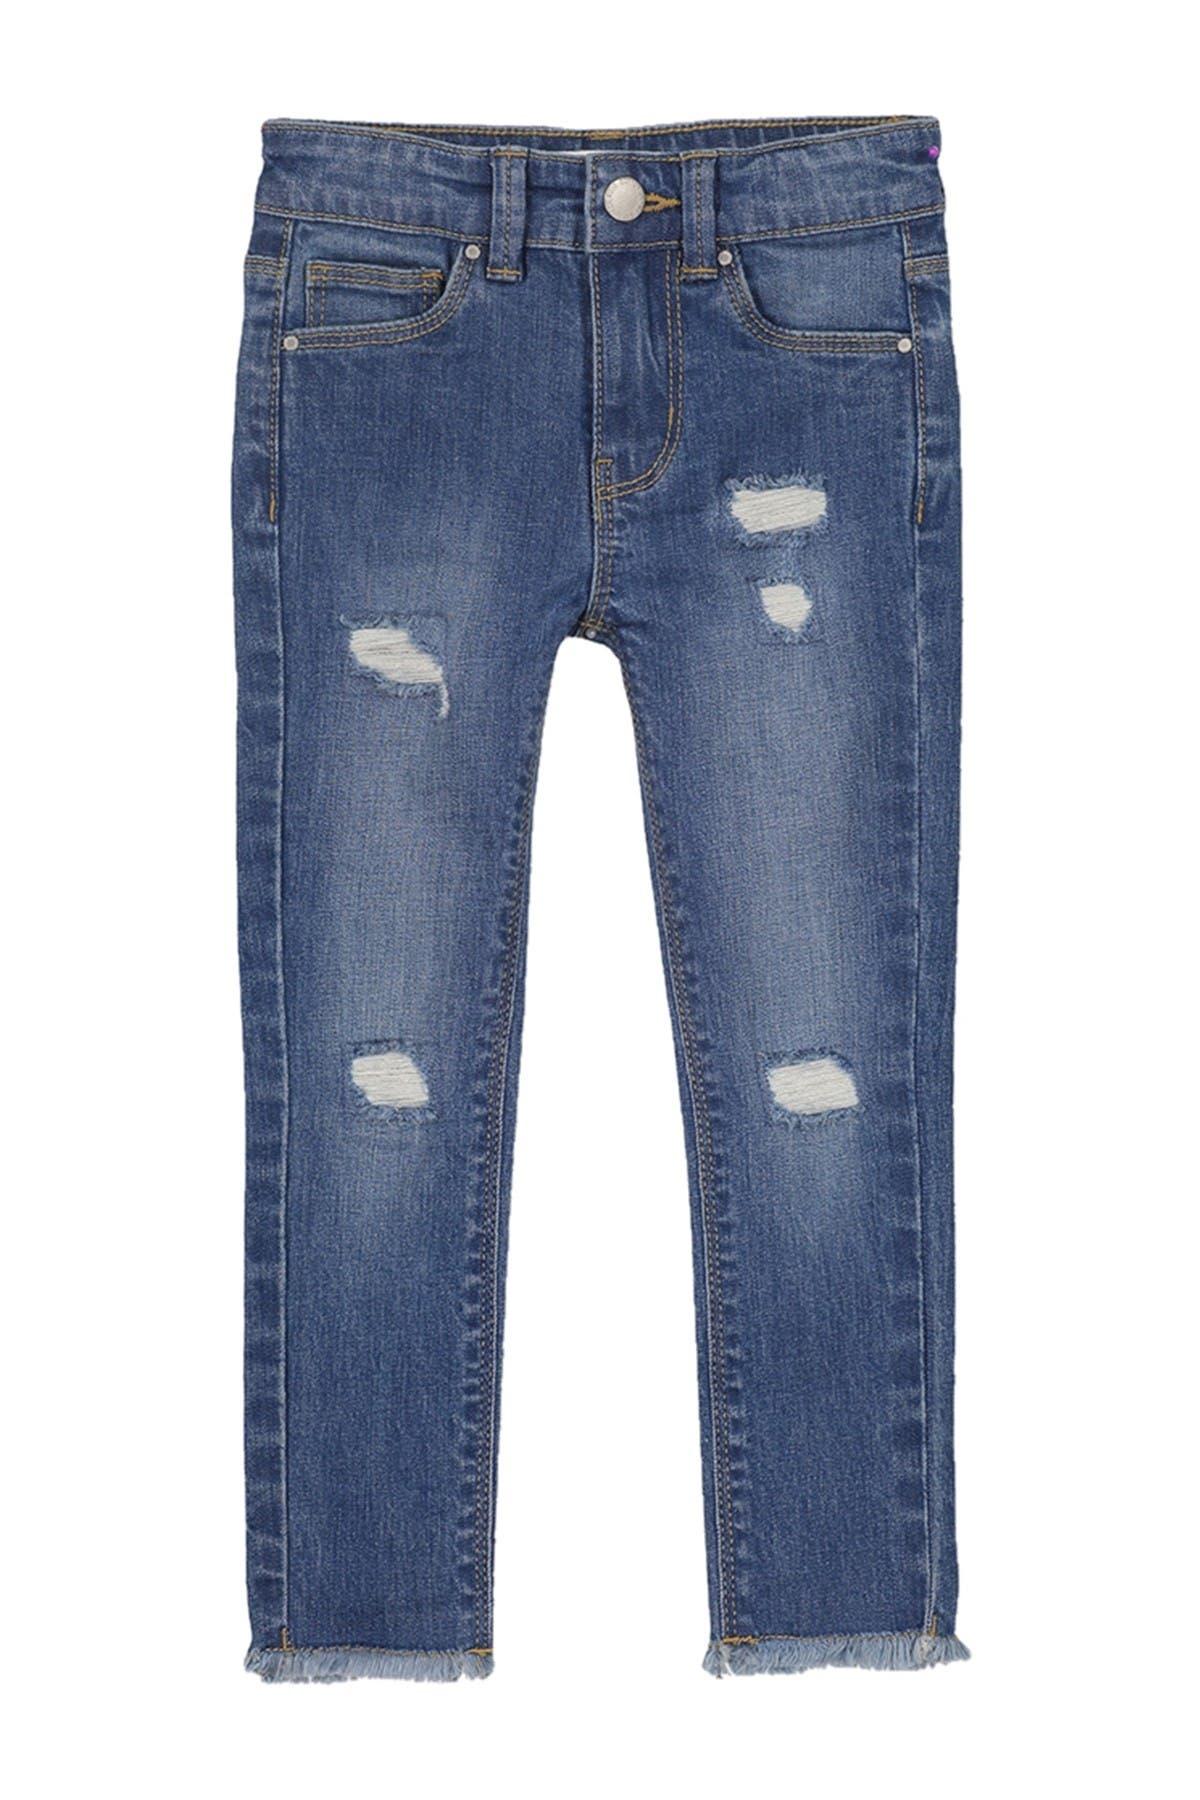 Image of Cotton On Drea Jeans